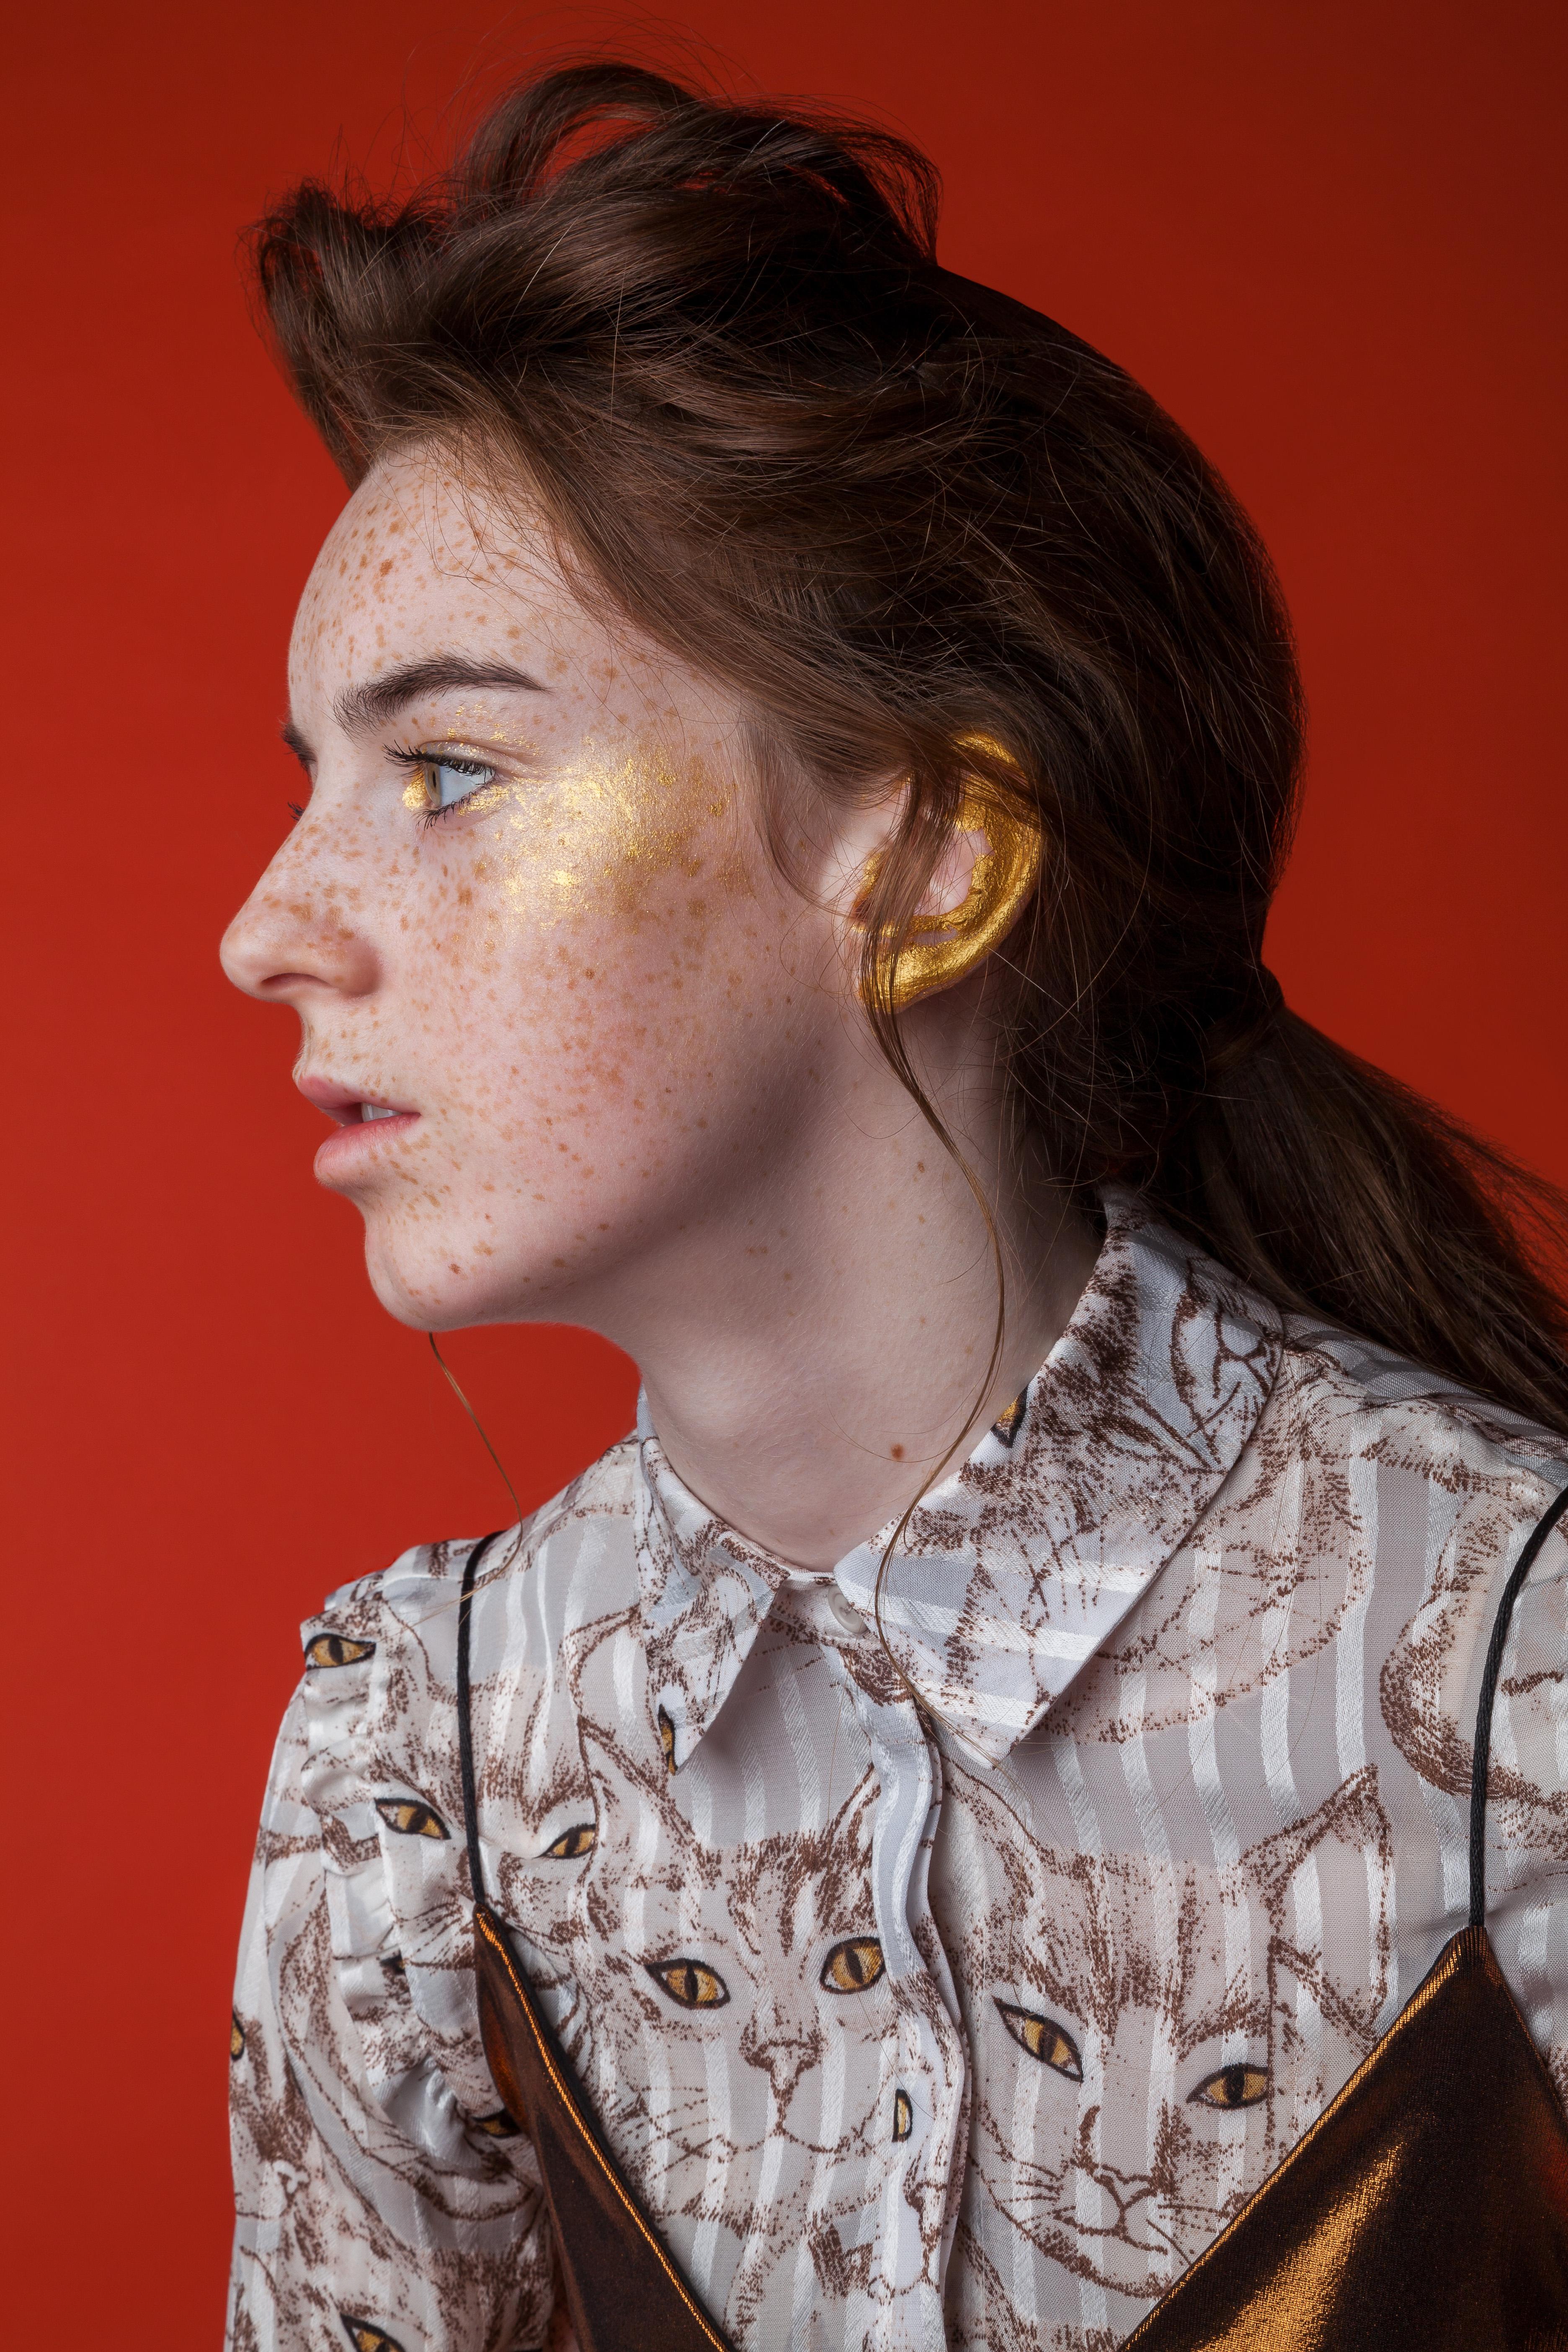 Photo Mary Savvidou. Model Bronwen.